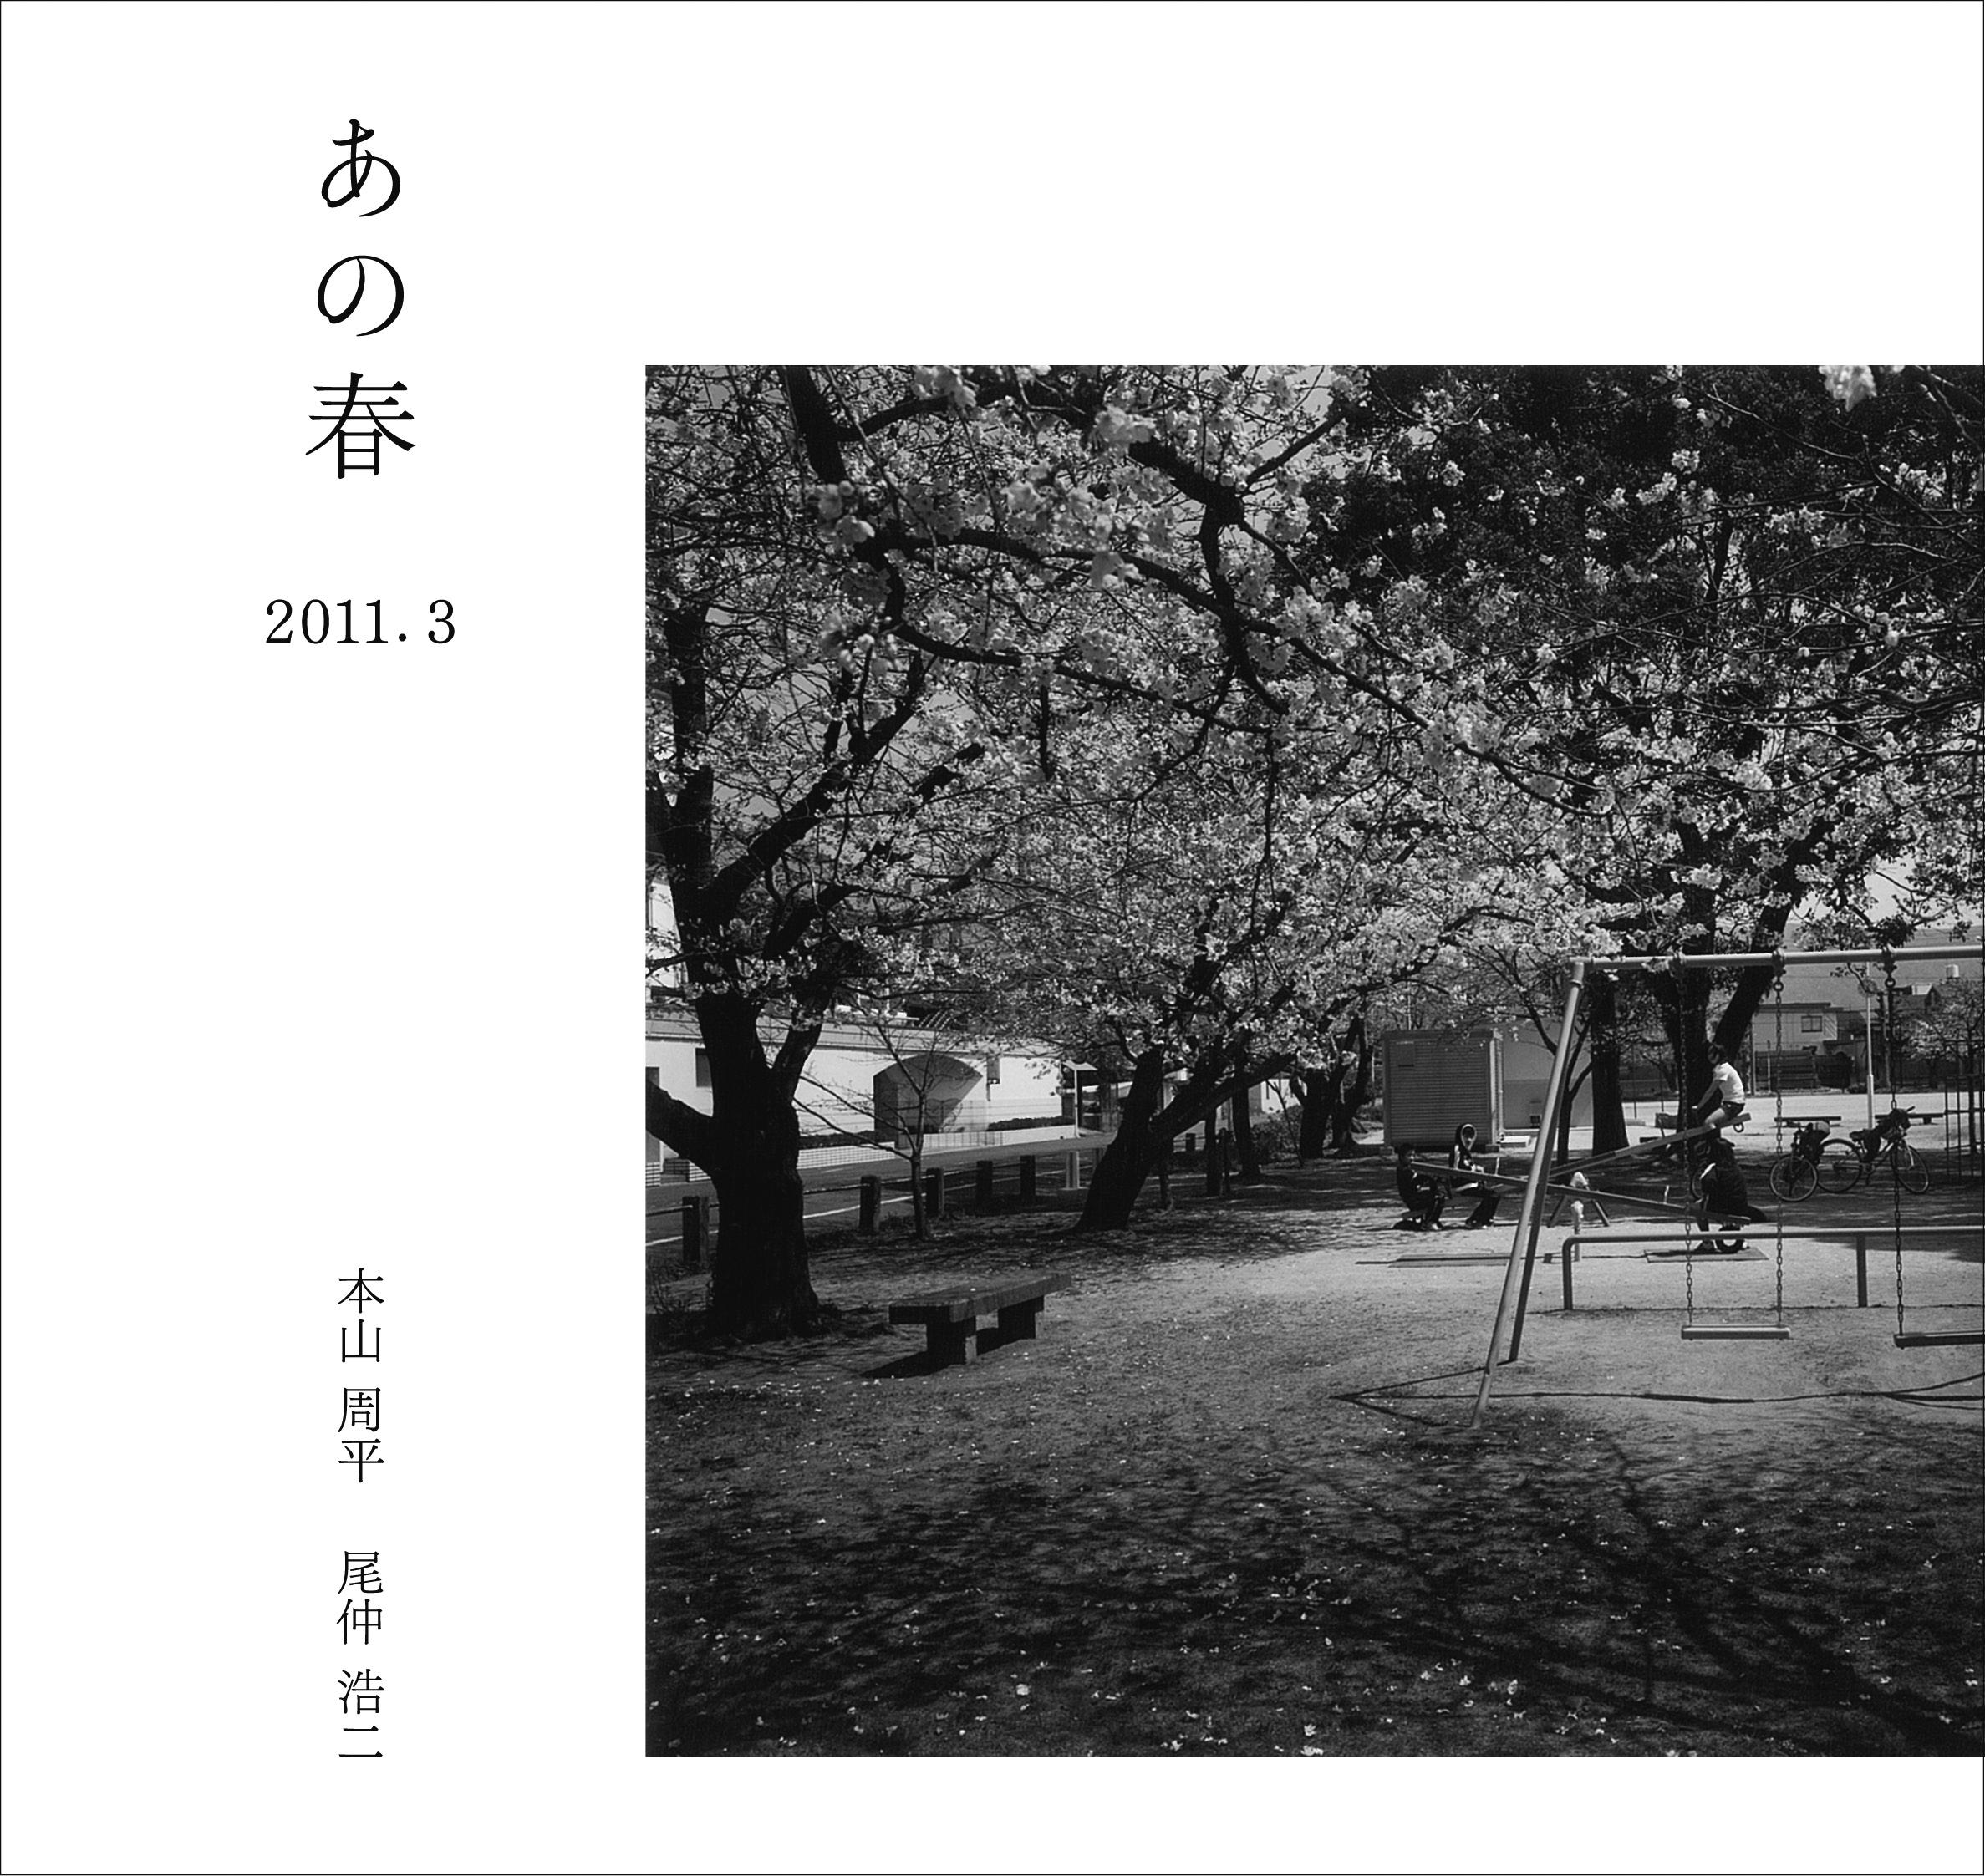 anoharu_hyoushi_motoyama